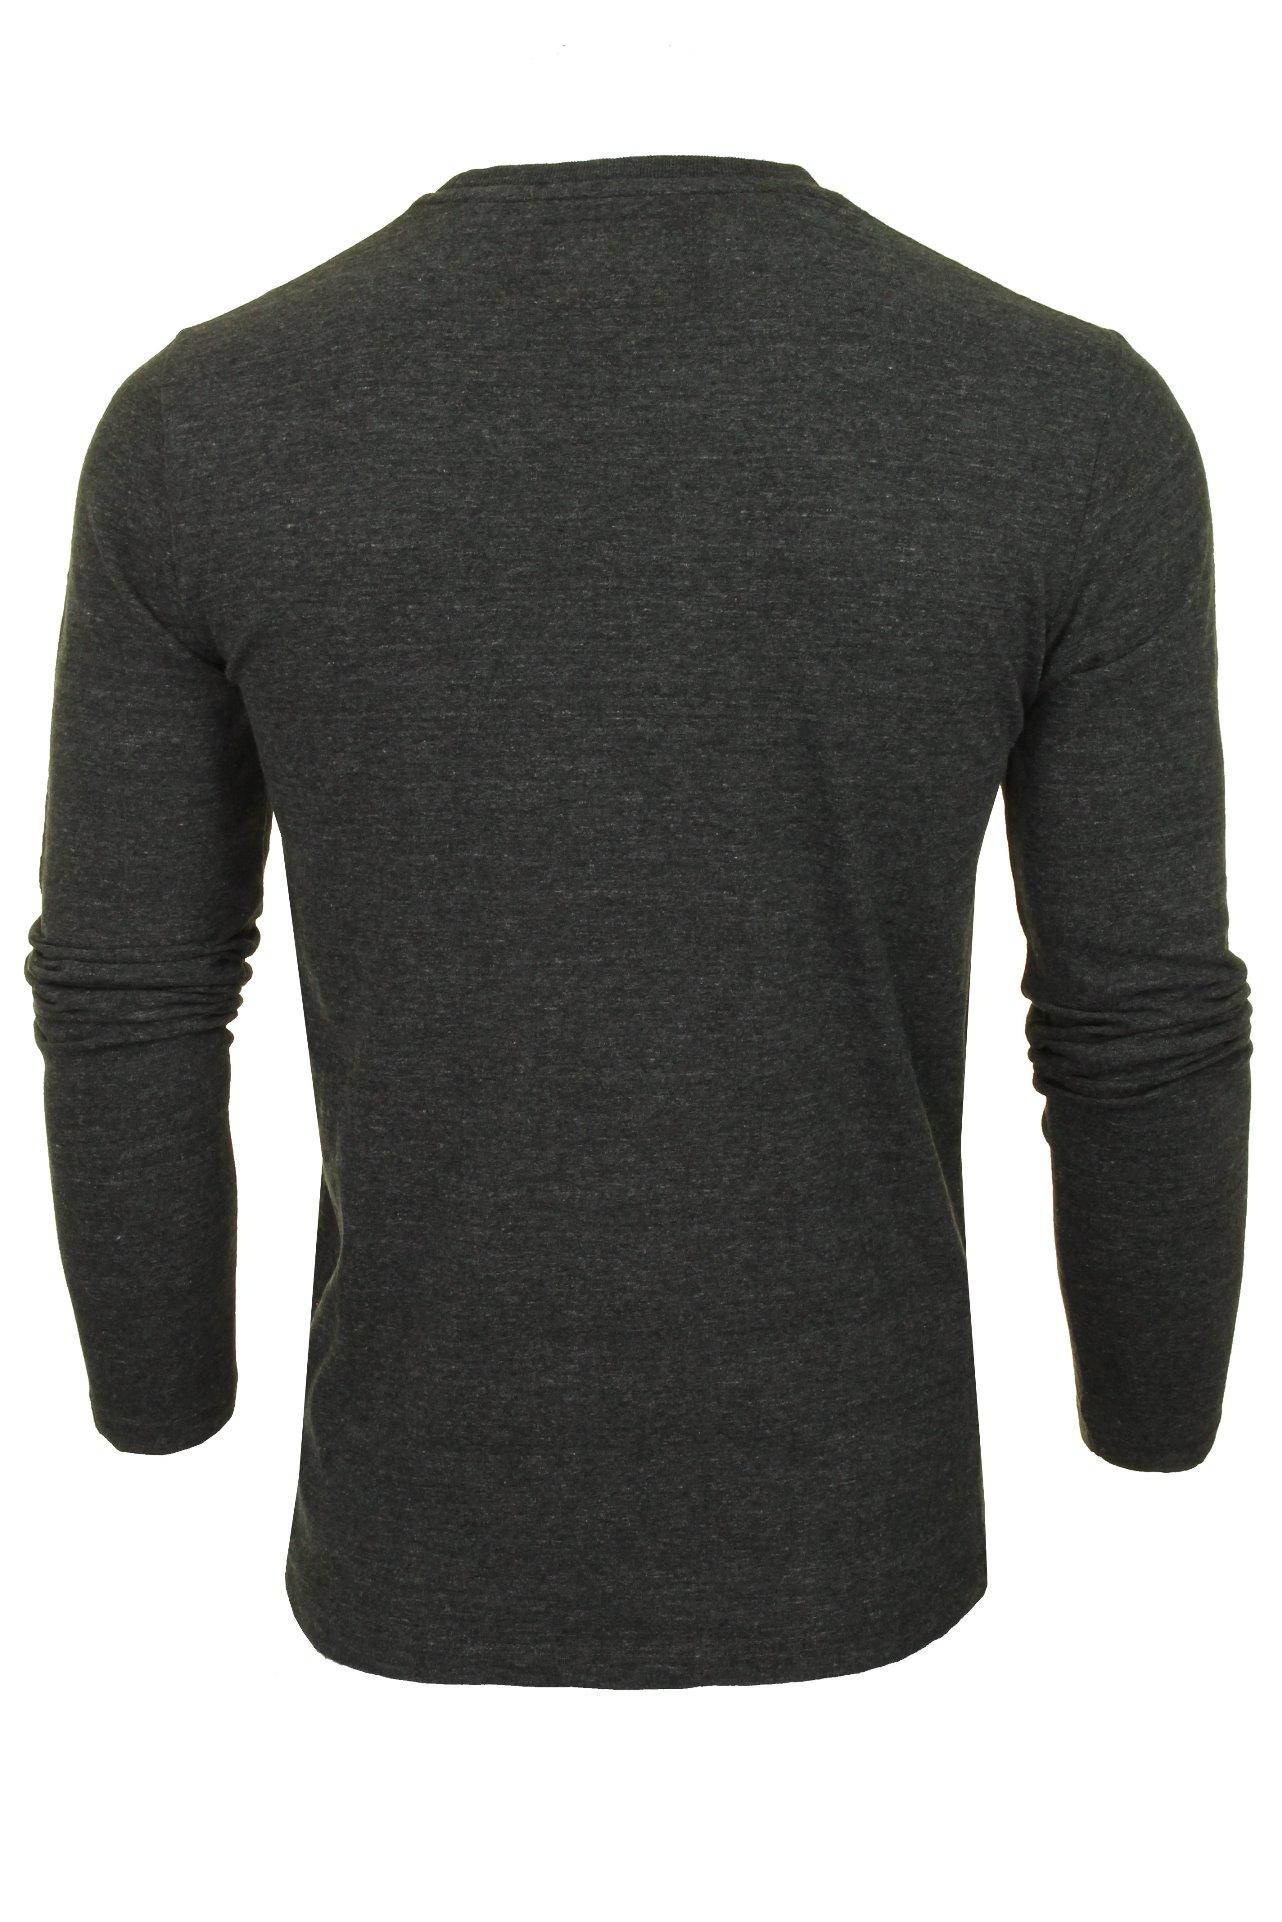 Superdry-T-shirt-homme-034-Orange-Label-Vintage-EMB-L-S-Tee-034-a-Manches-Longues miniature 4